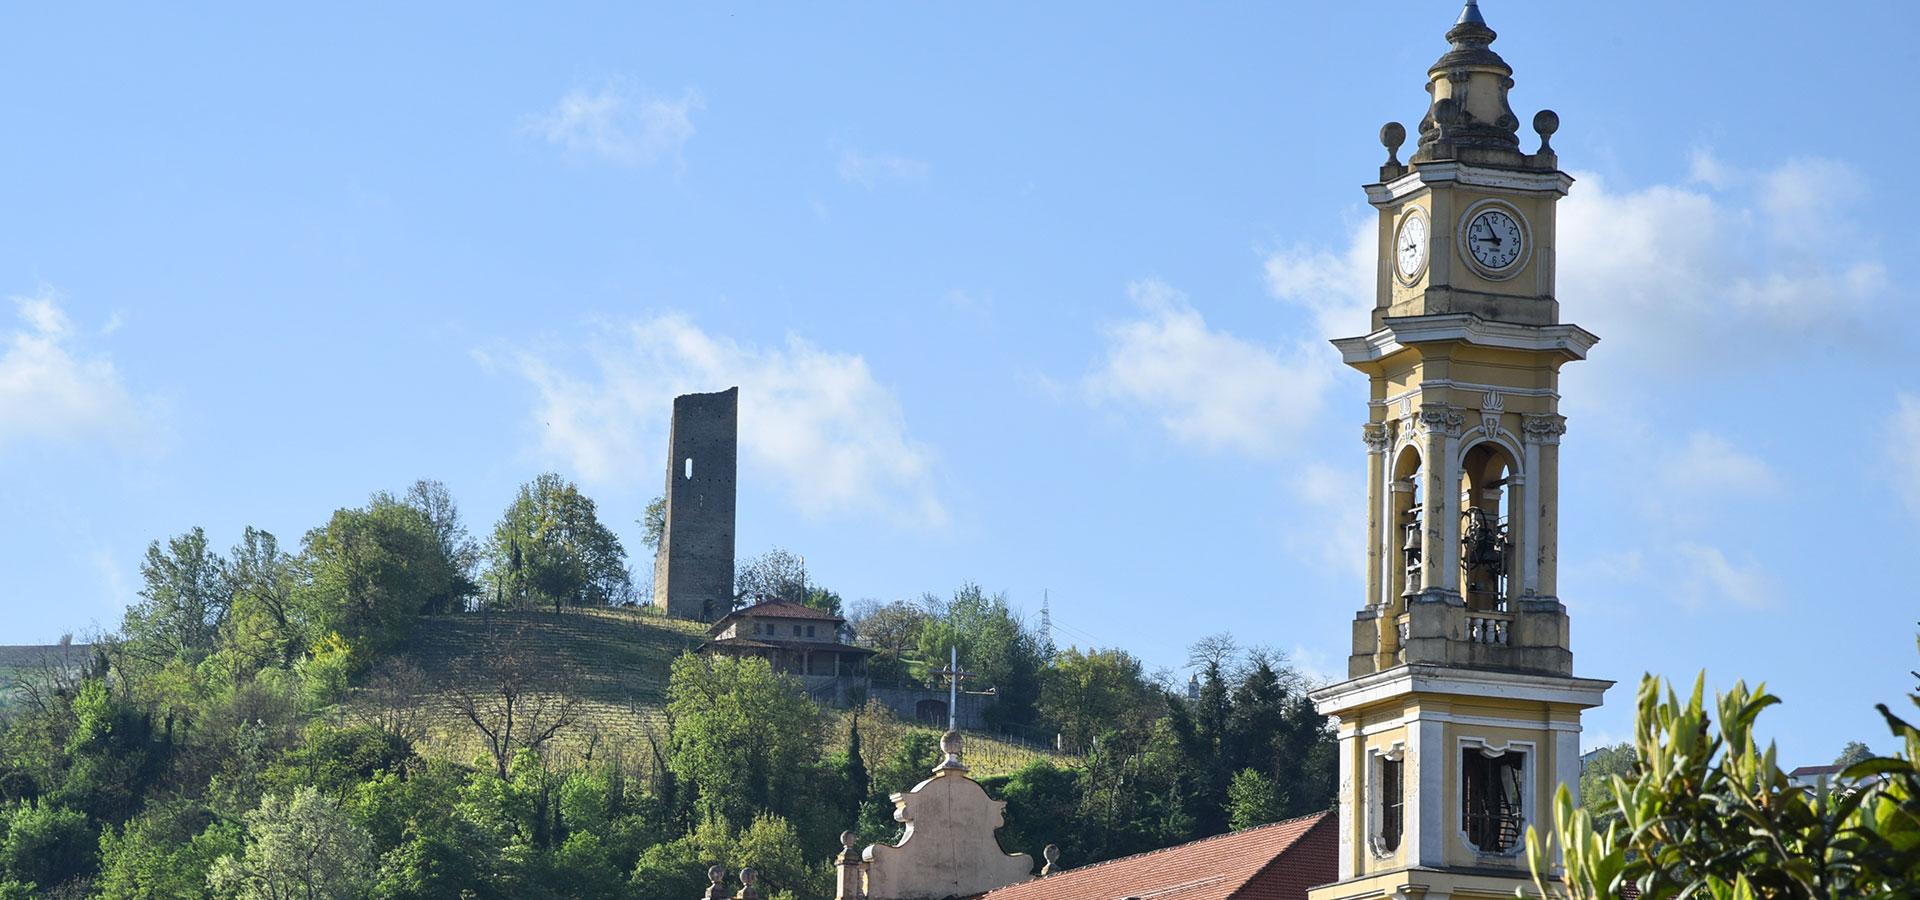 torre-santo-stefano-belbo-3